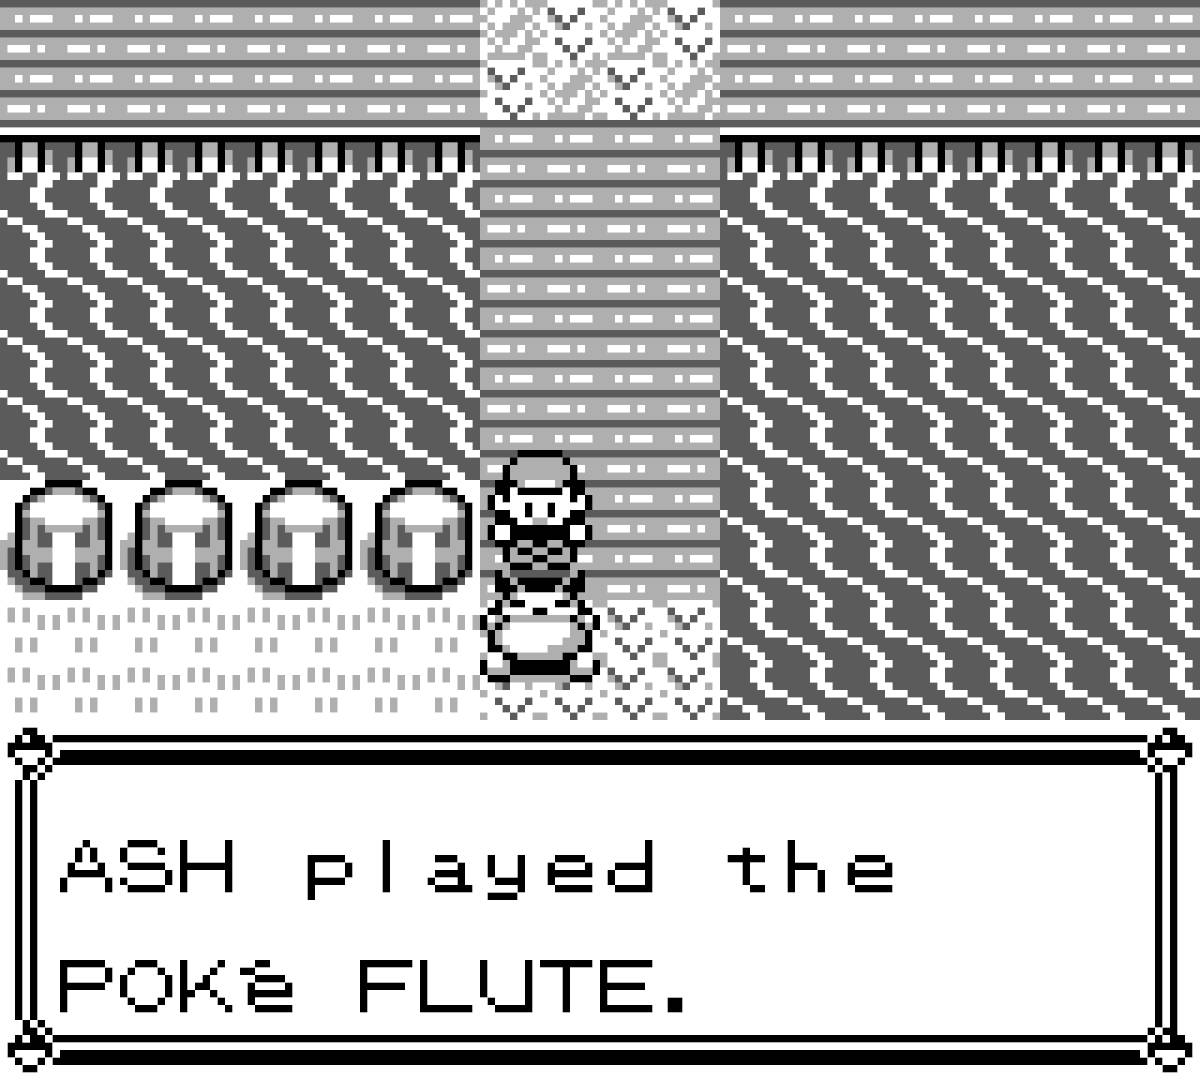 Image from Pokemon Blue (Public Domain)